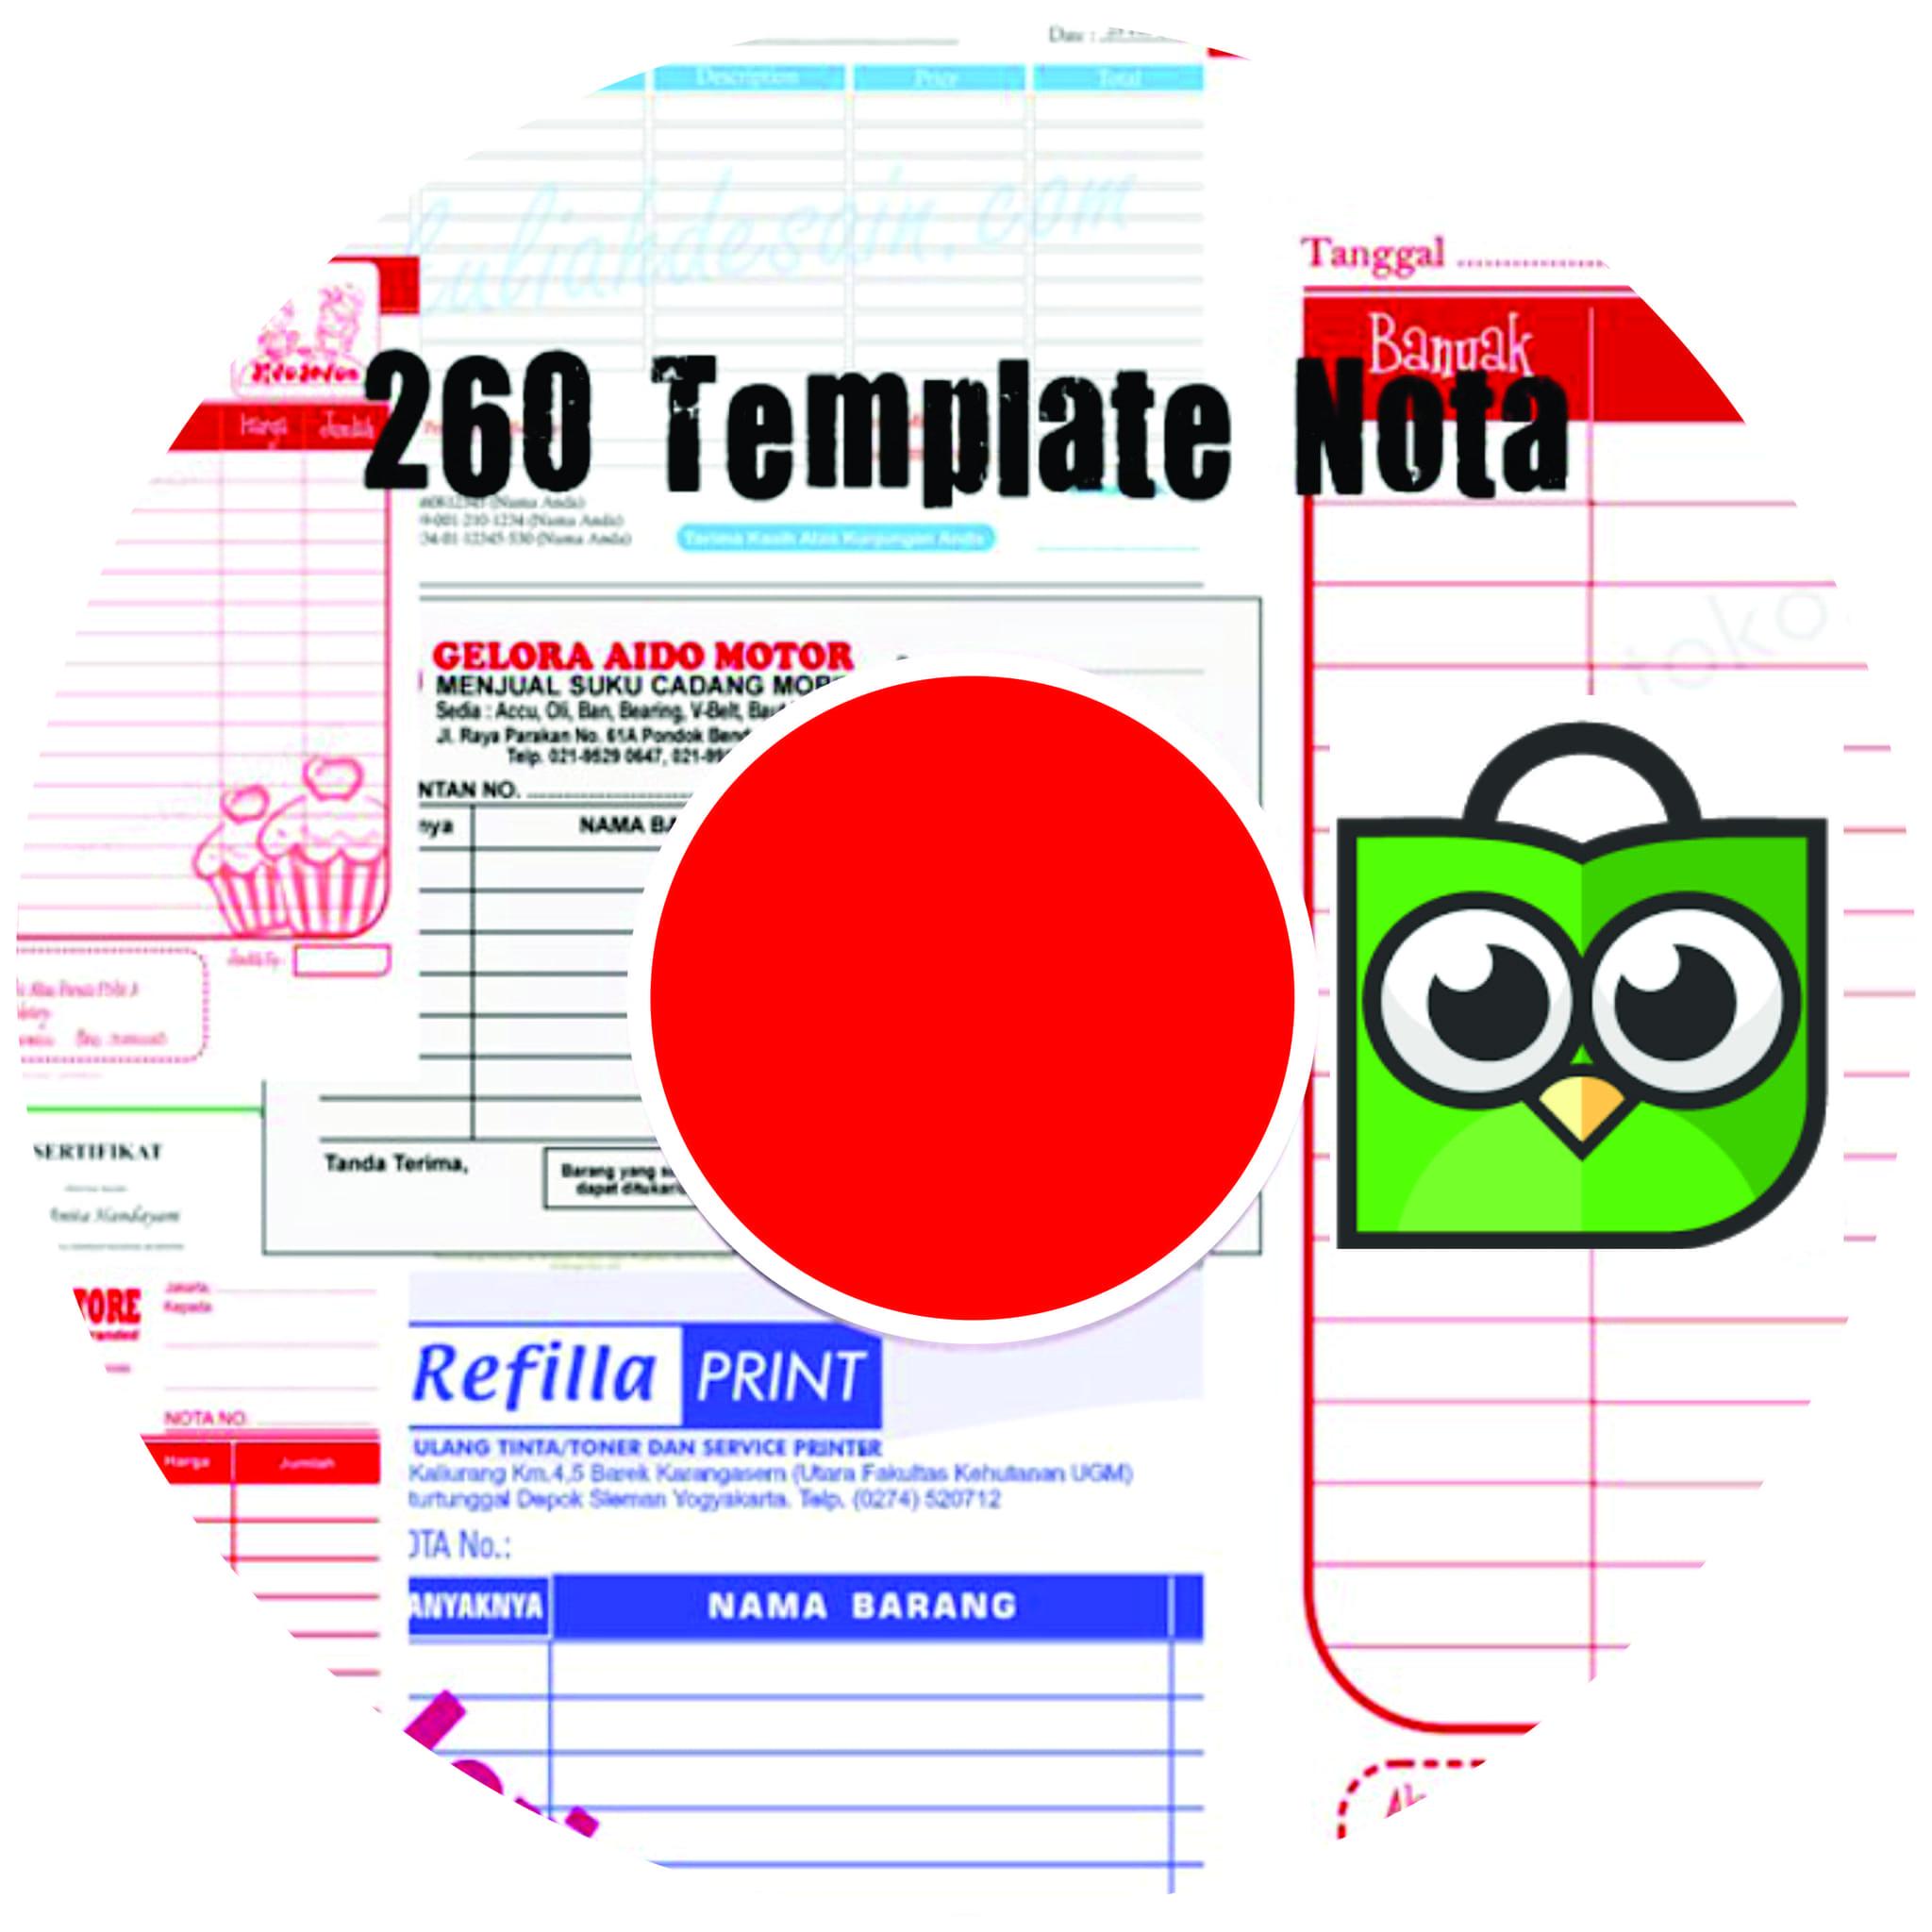 600+ Ide Template Desain Amplop Cdr HD Gratid Untuk Di Contoh